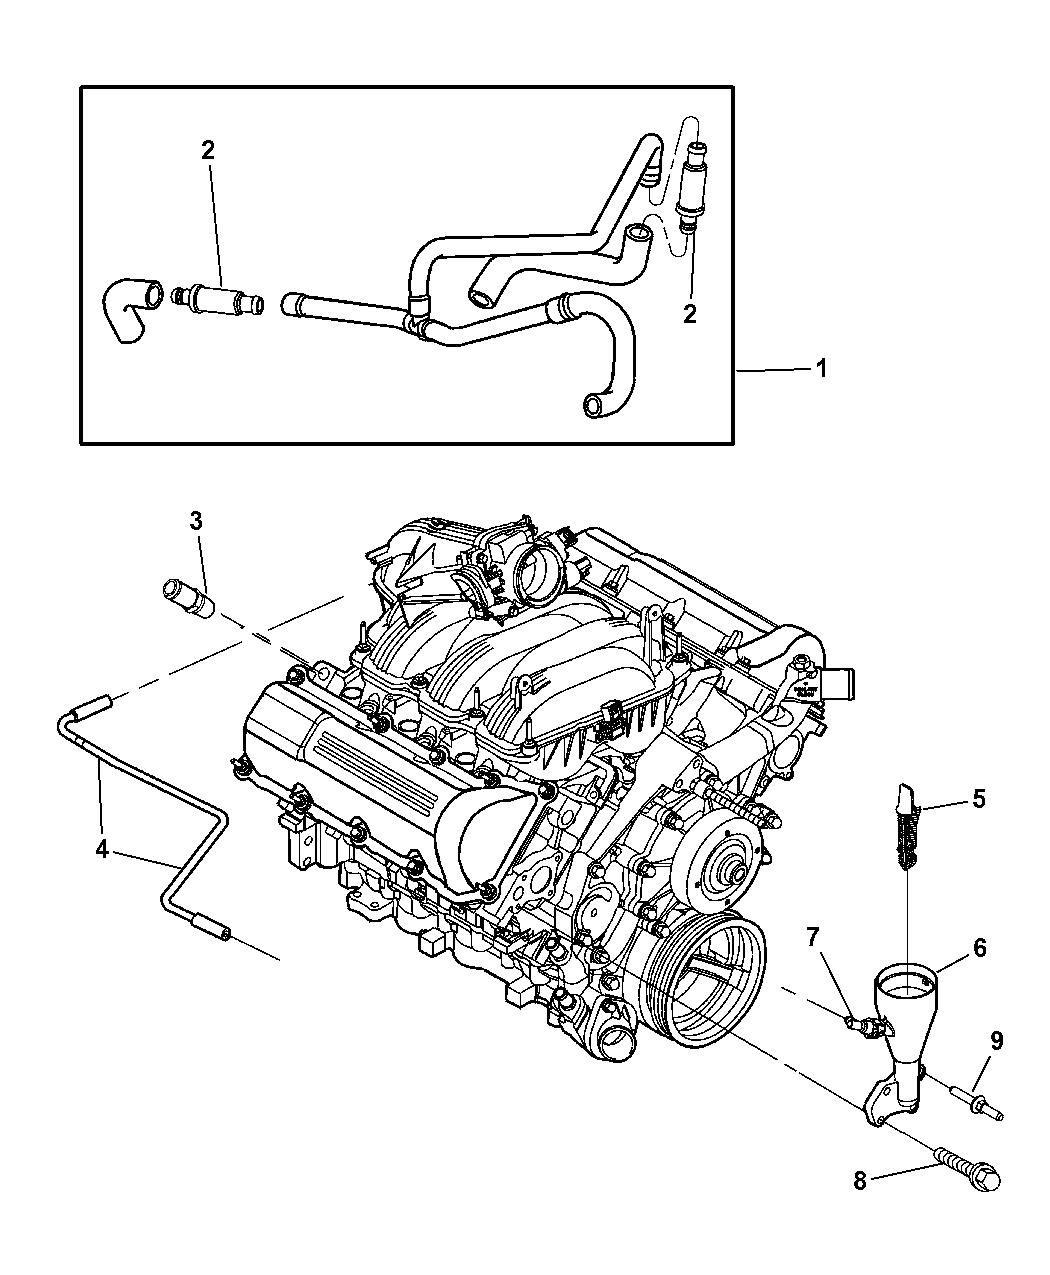 2005 jeep liberty limited 4wd engine diagram  u2022 wiring